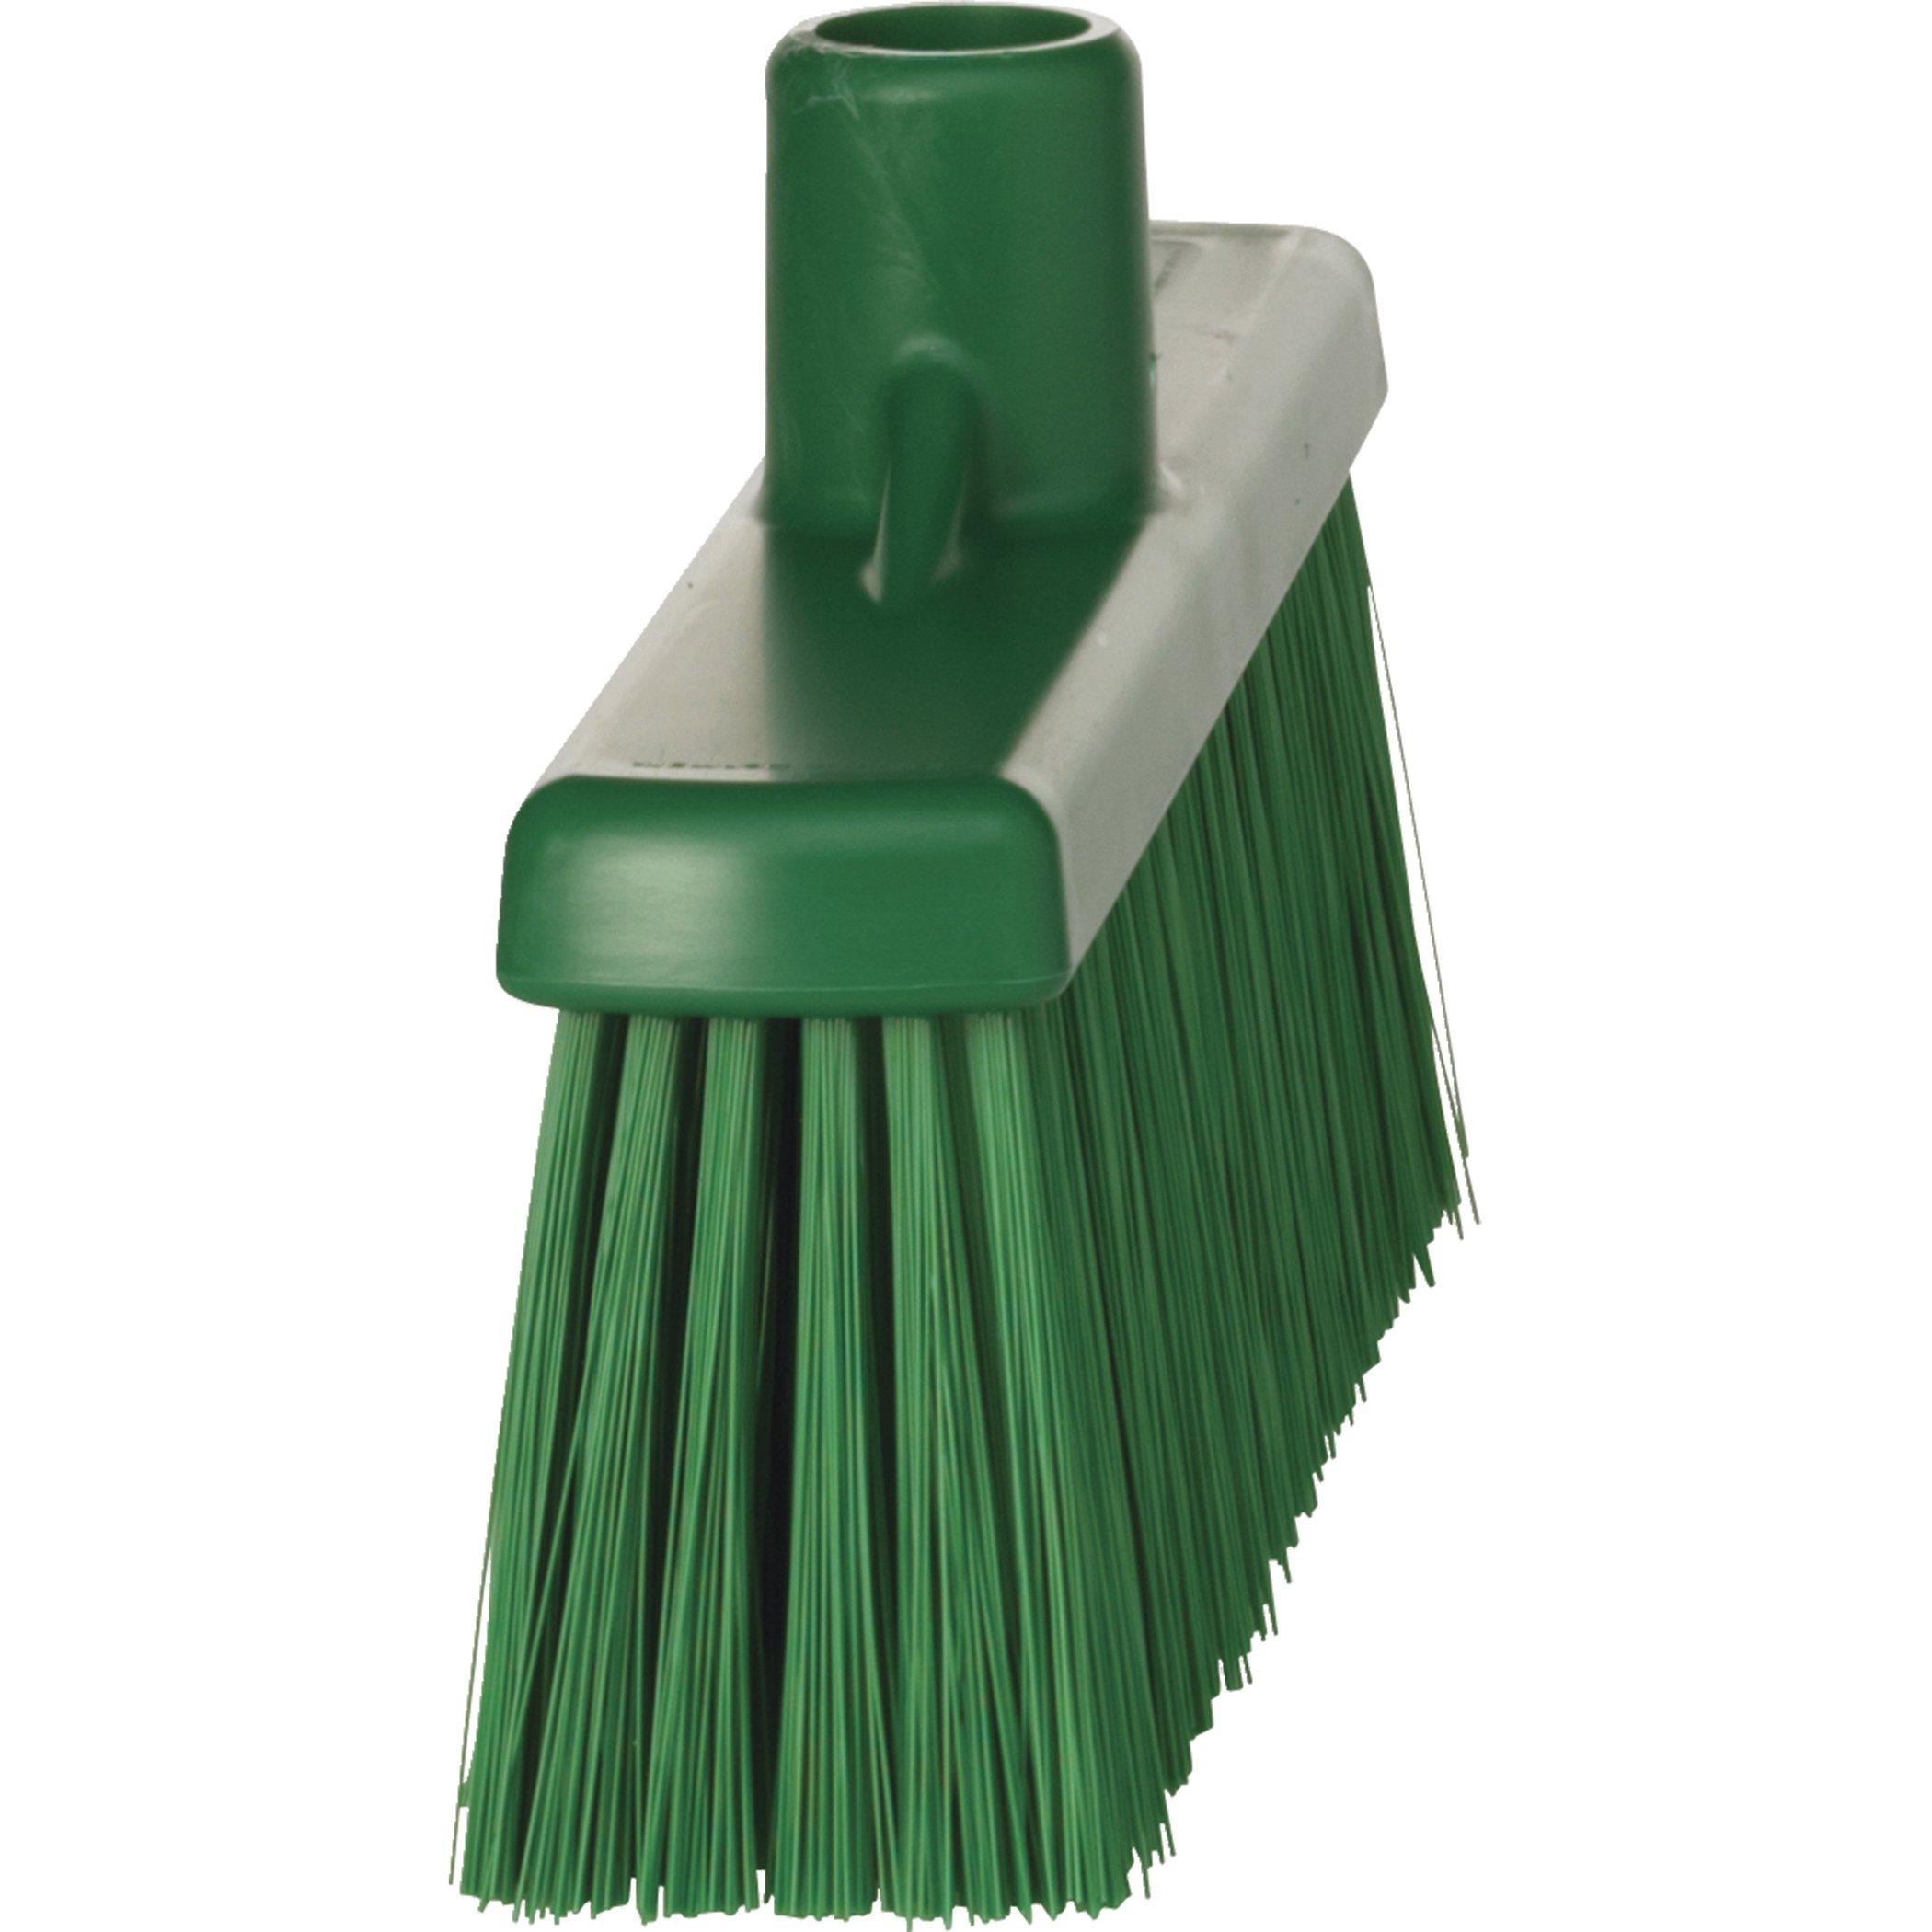 Vikan 31662 Medium Sweep Floor Broom Head, Polypropylene Block, 12-1/4'' Polyester Bristle, Green